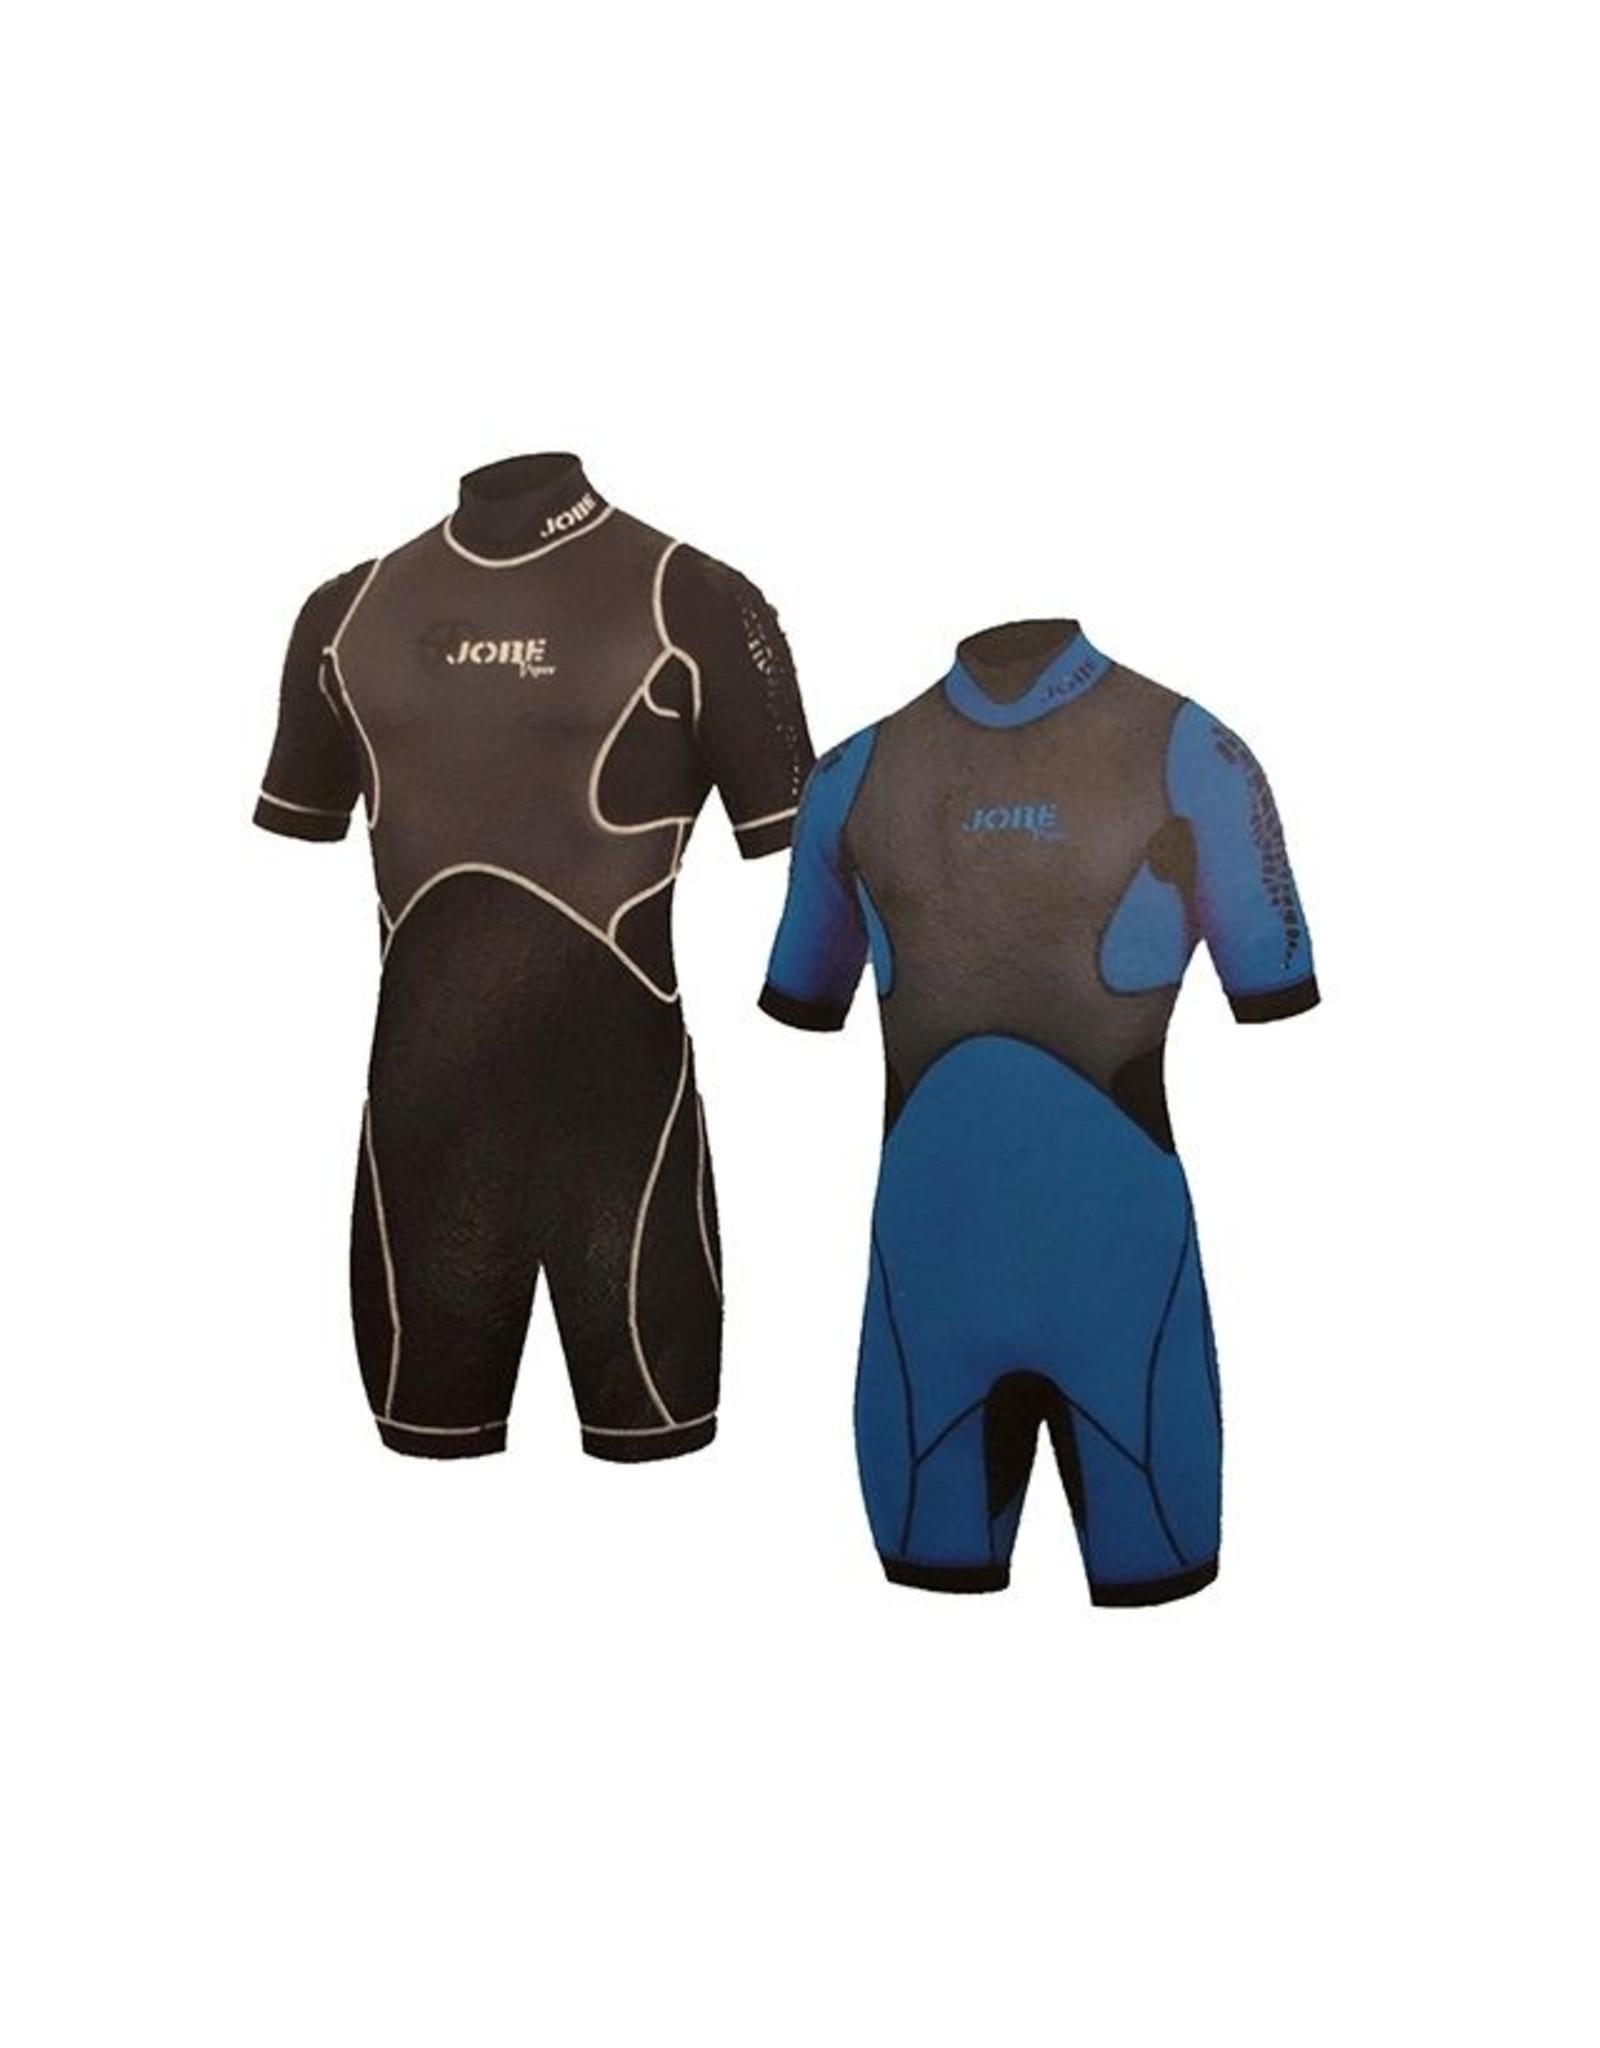 Hebor Watersport Jobe Shorty Viper wetsuit